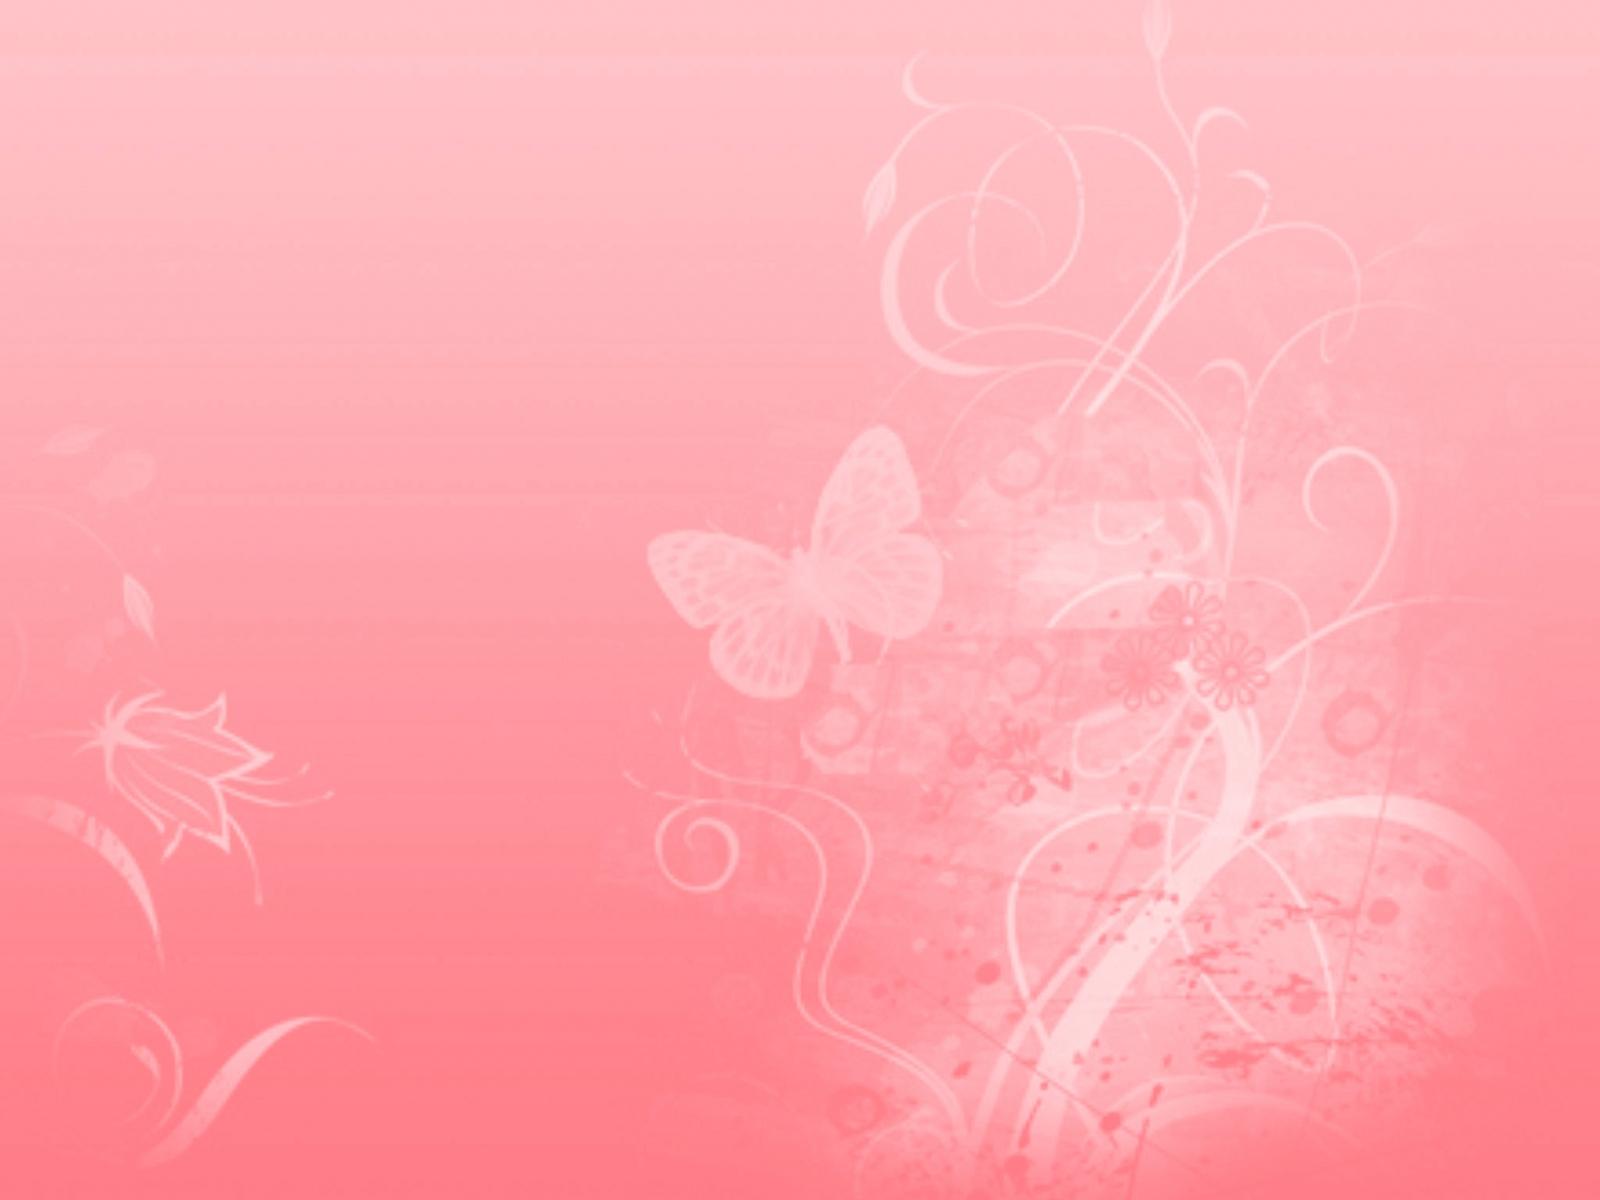 Pink Floral Desktop Wallpaper 1600x1200px